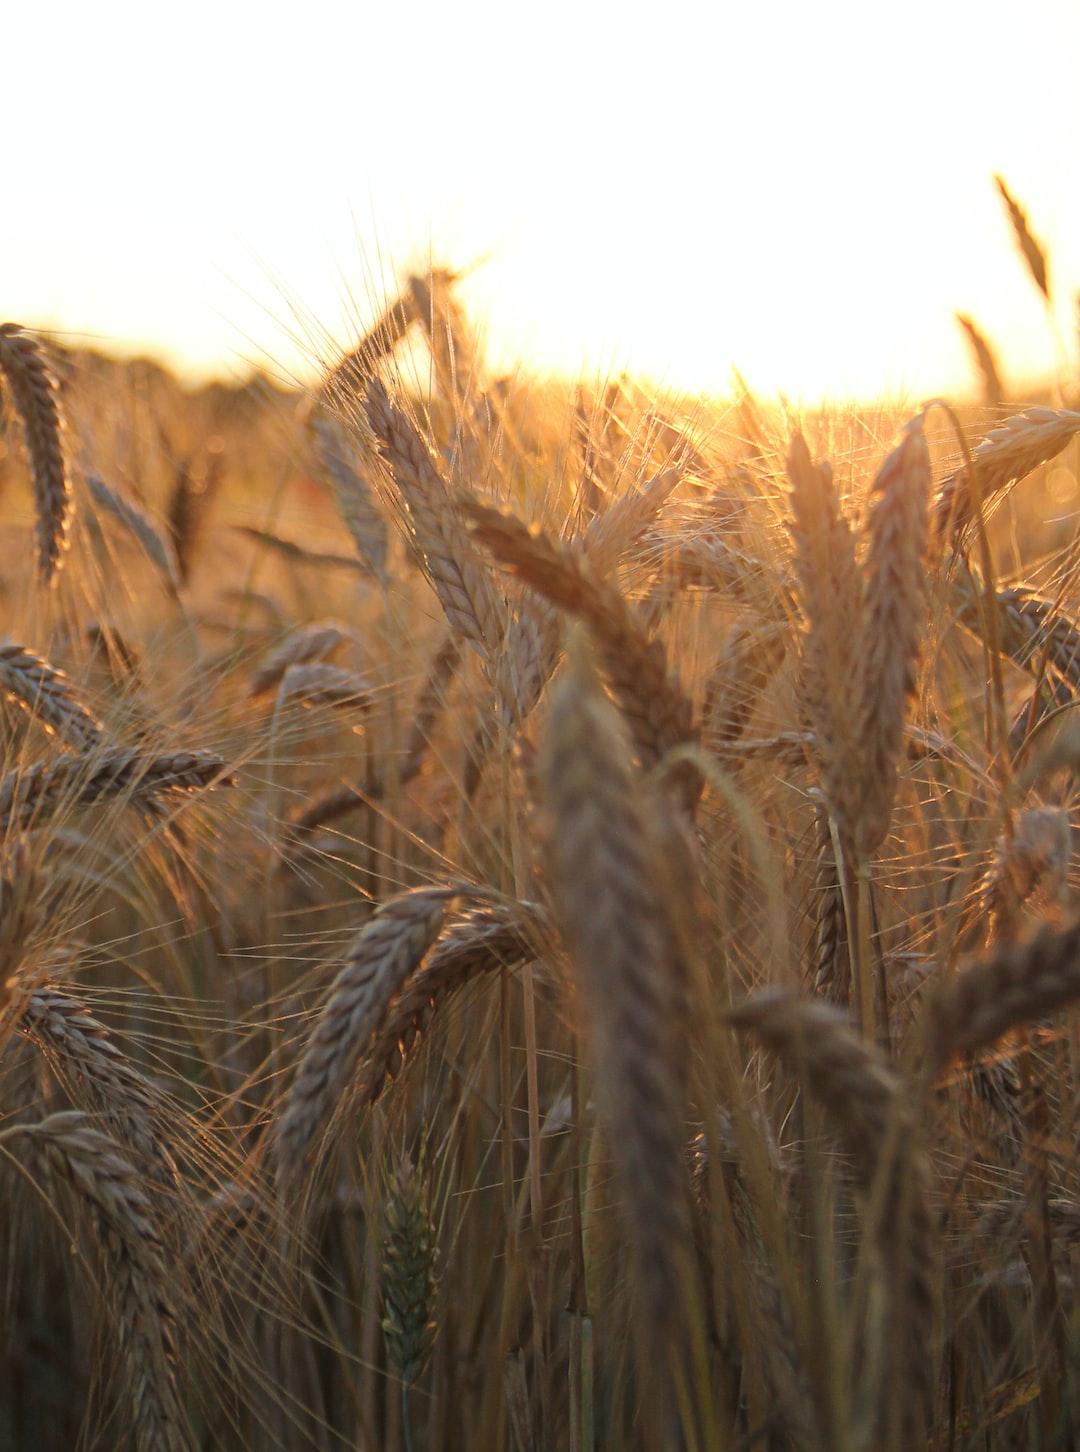 Wheat in the sunlight.